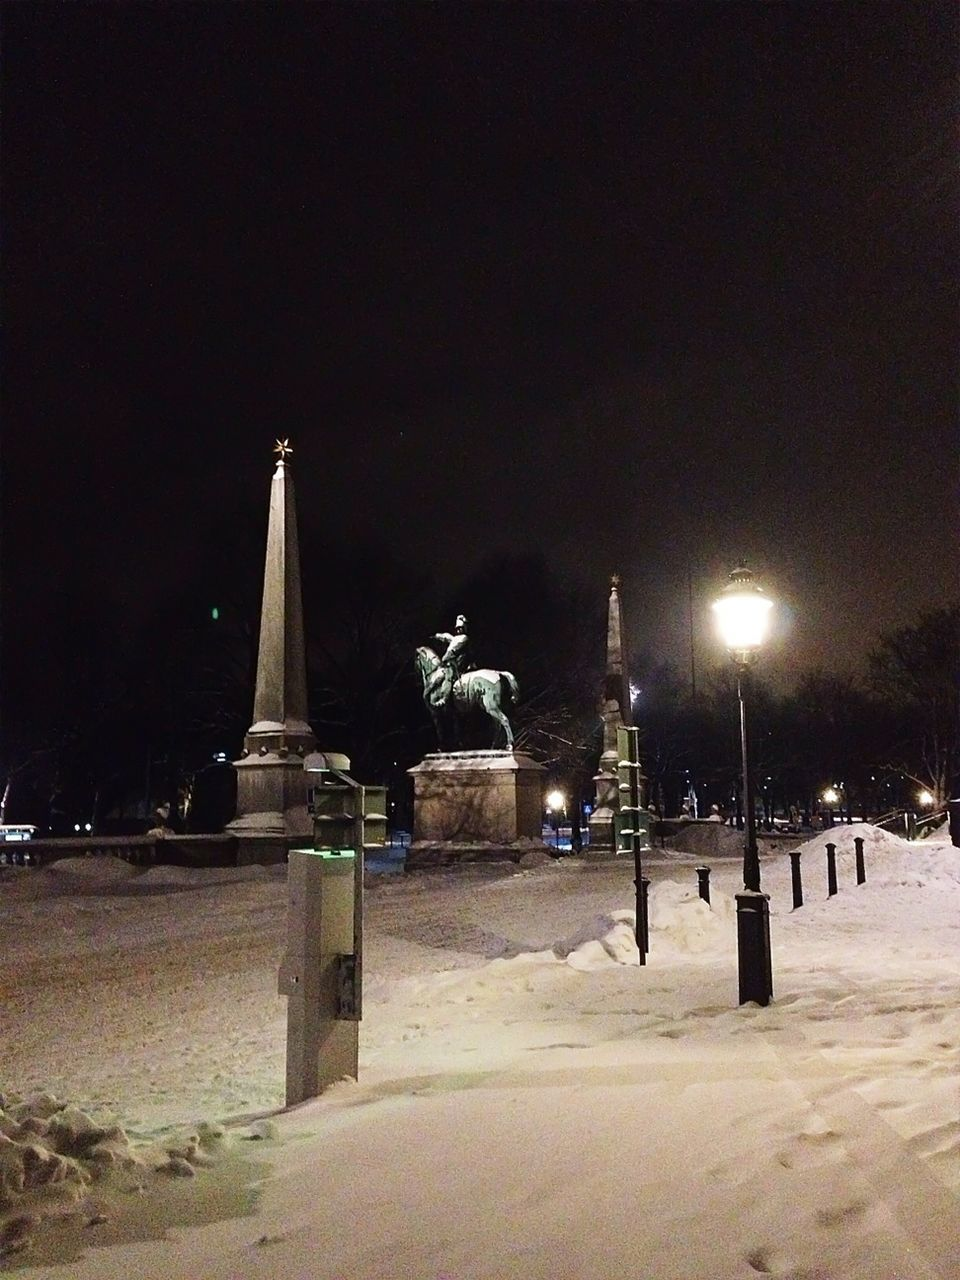 night, winter, illuminated, cold temperature, snow, street light, outdoors, sculpture, statue, travel destinations, no people, nature, architecture, sky